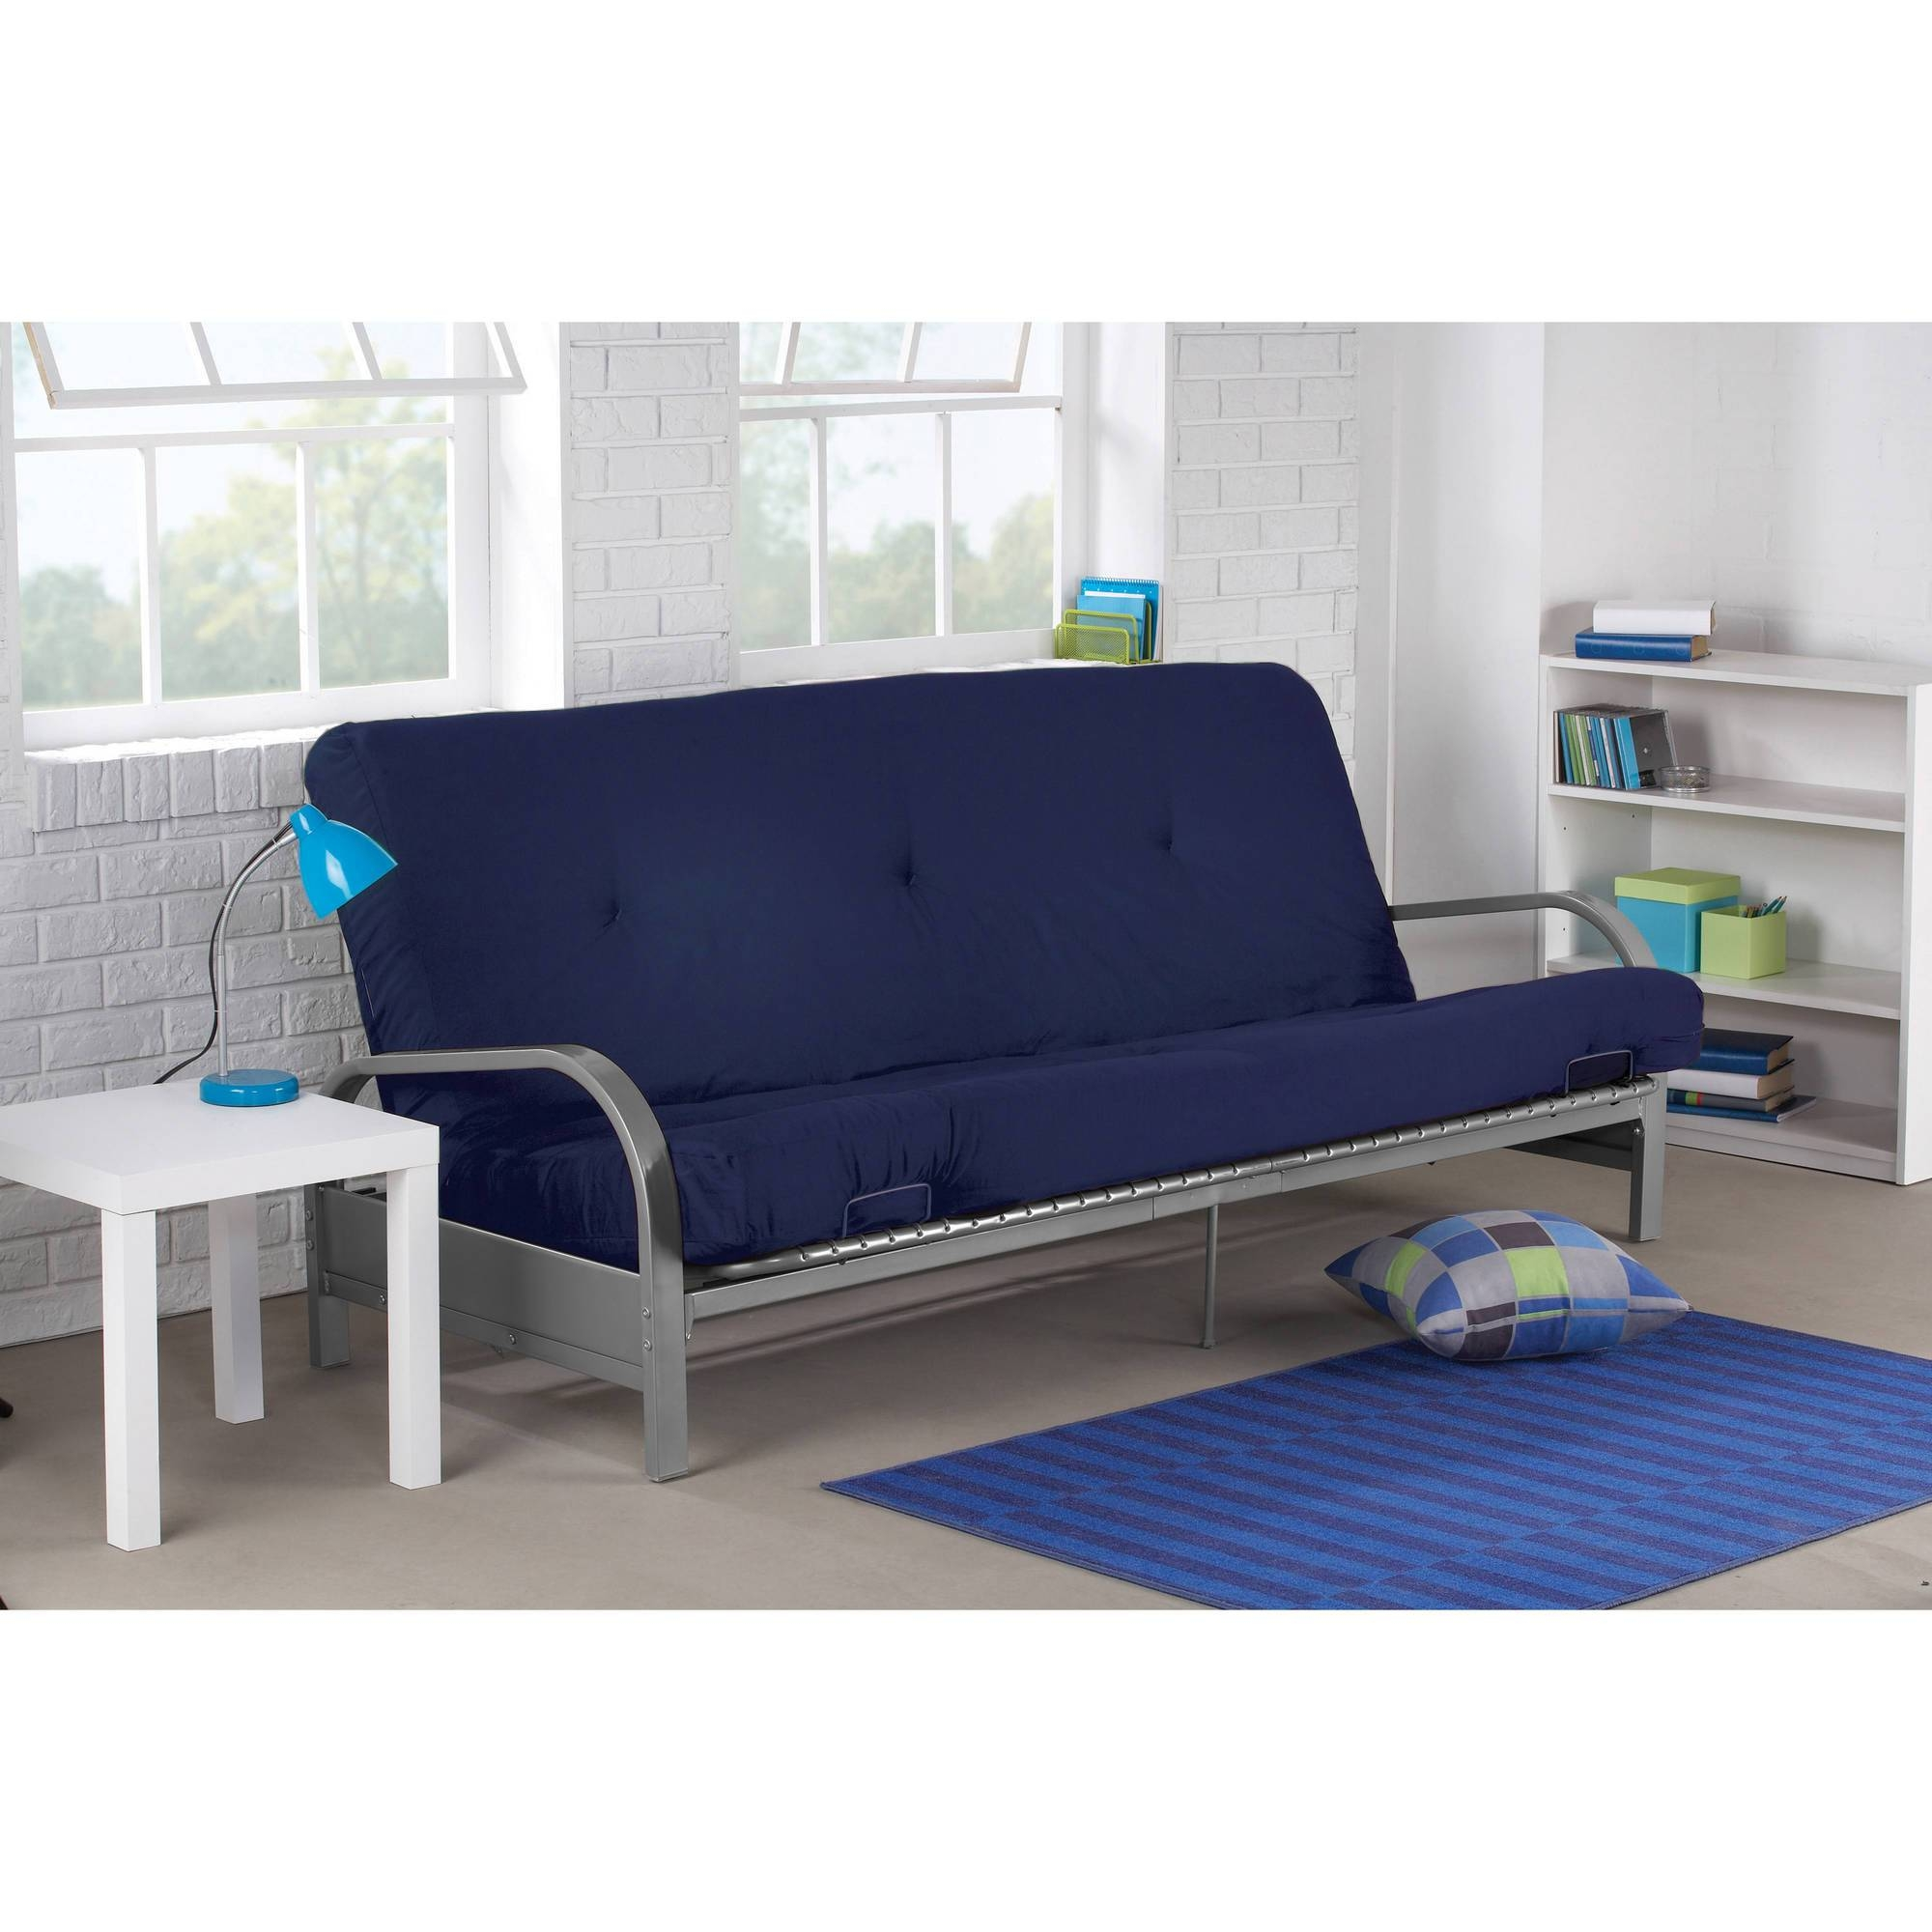 Beautiful Futon Sofa Bed Walmart Contemporary - Home Ideas Design for Mainstays Contempo Futon Sofa Beds (Image 1 of 15)